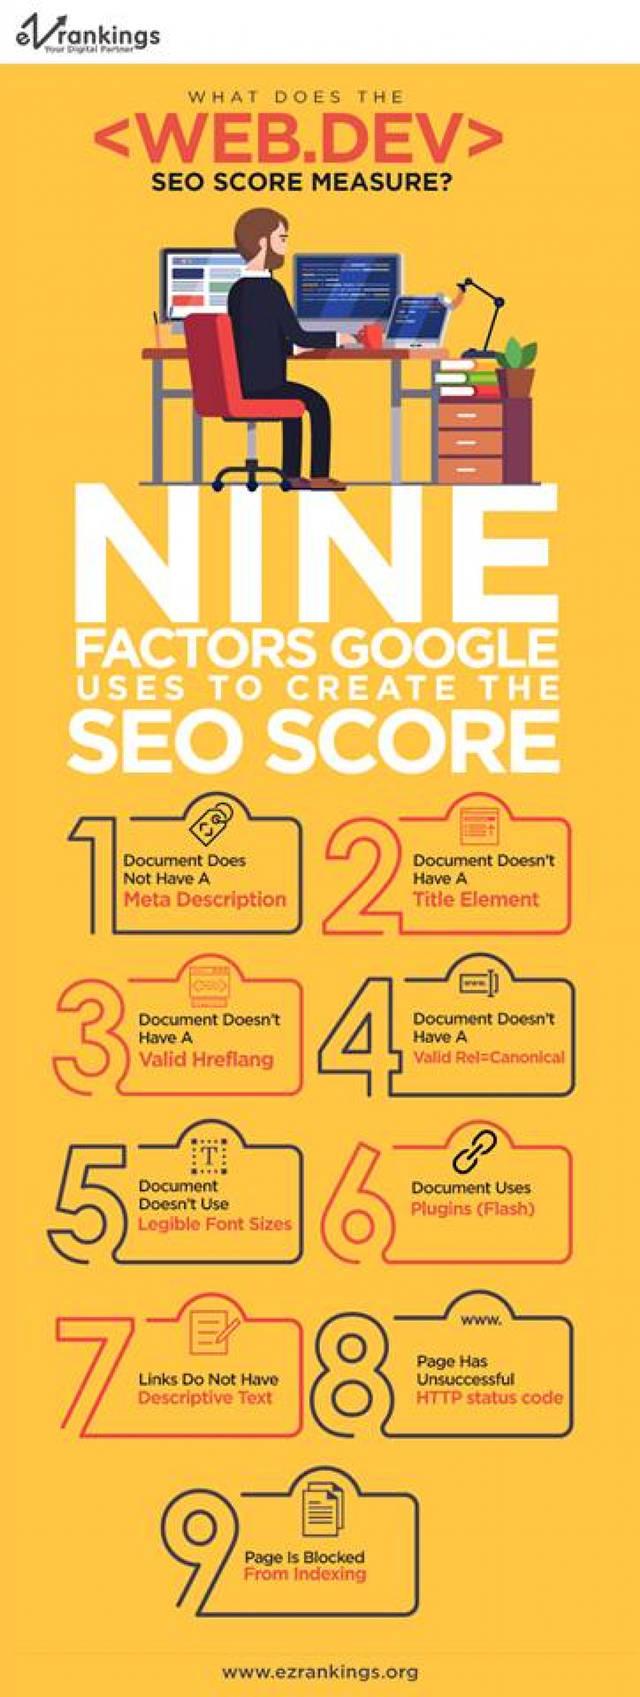 Nine factors google uses to create the seo score 5bf3e17249502 w1500